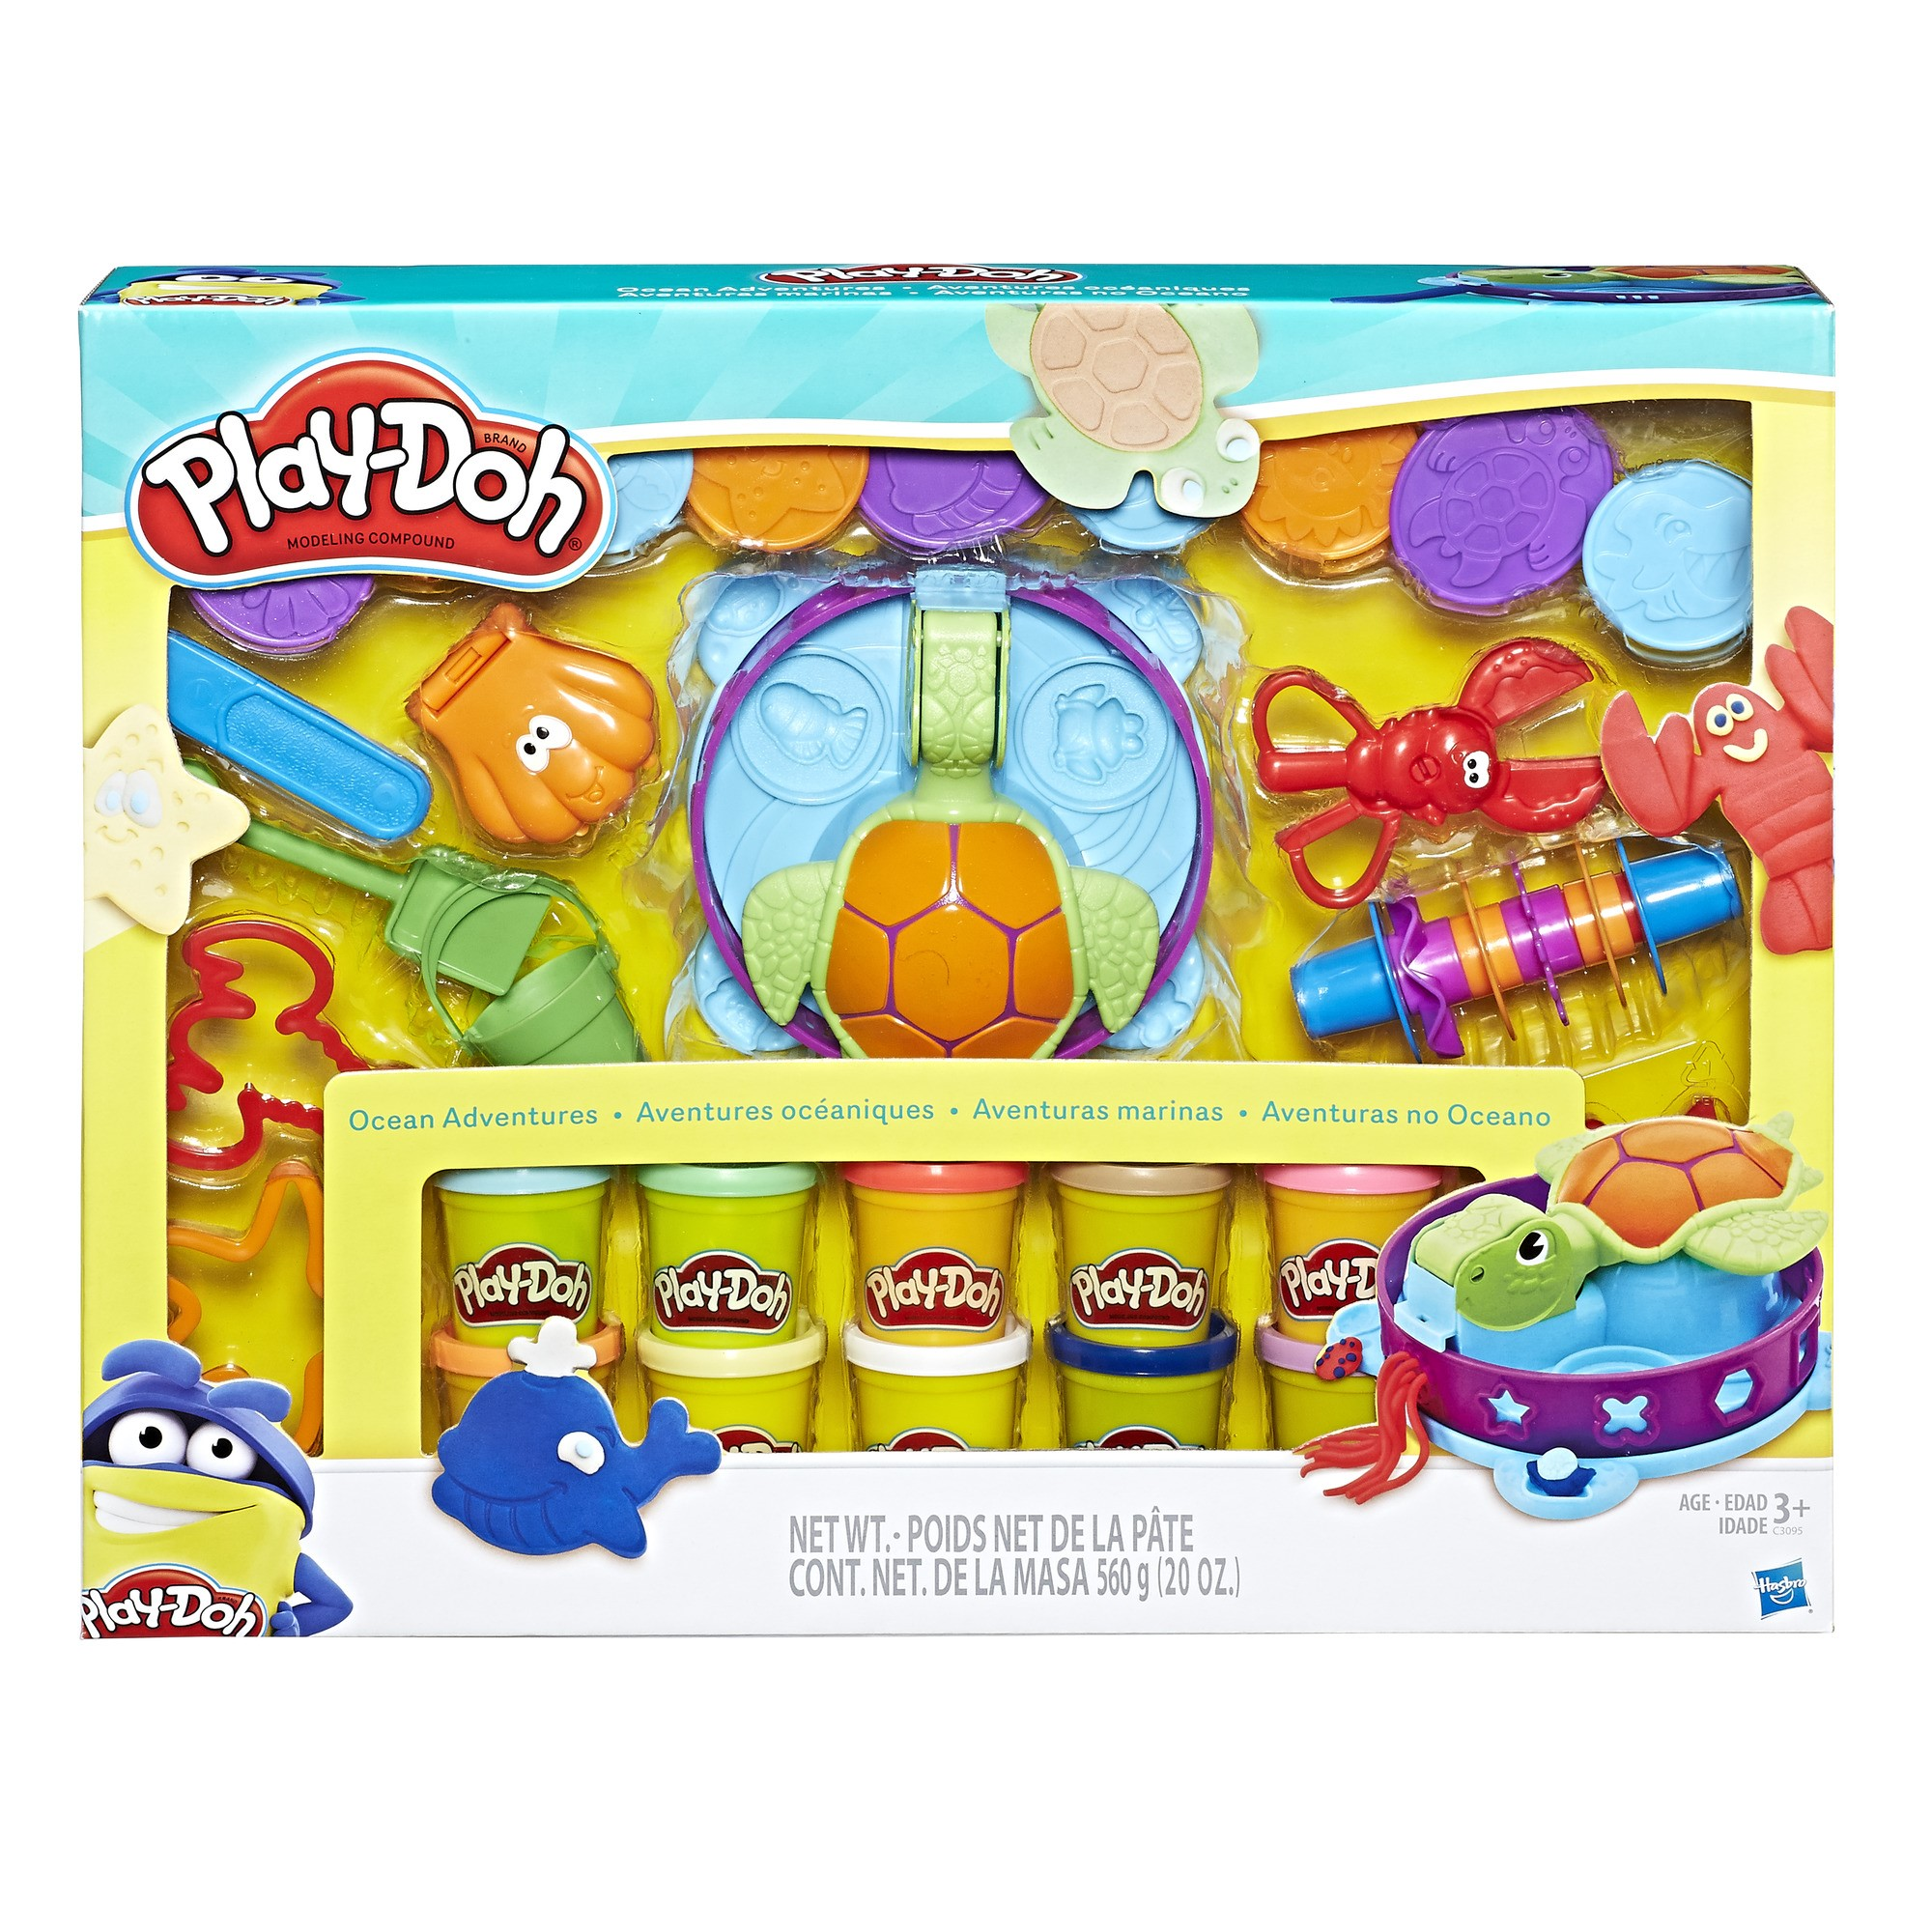 Play-Doh Ocean Adventure Mega Set with 10 Pack of Dough & 20 Tools!